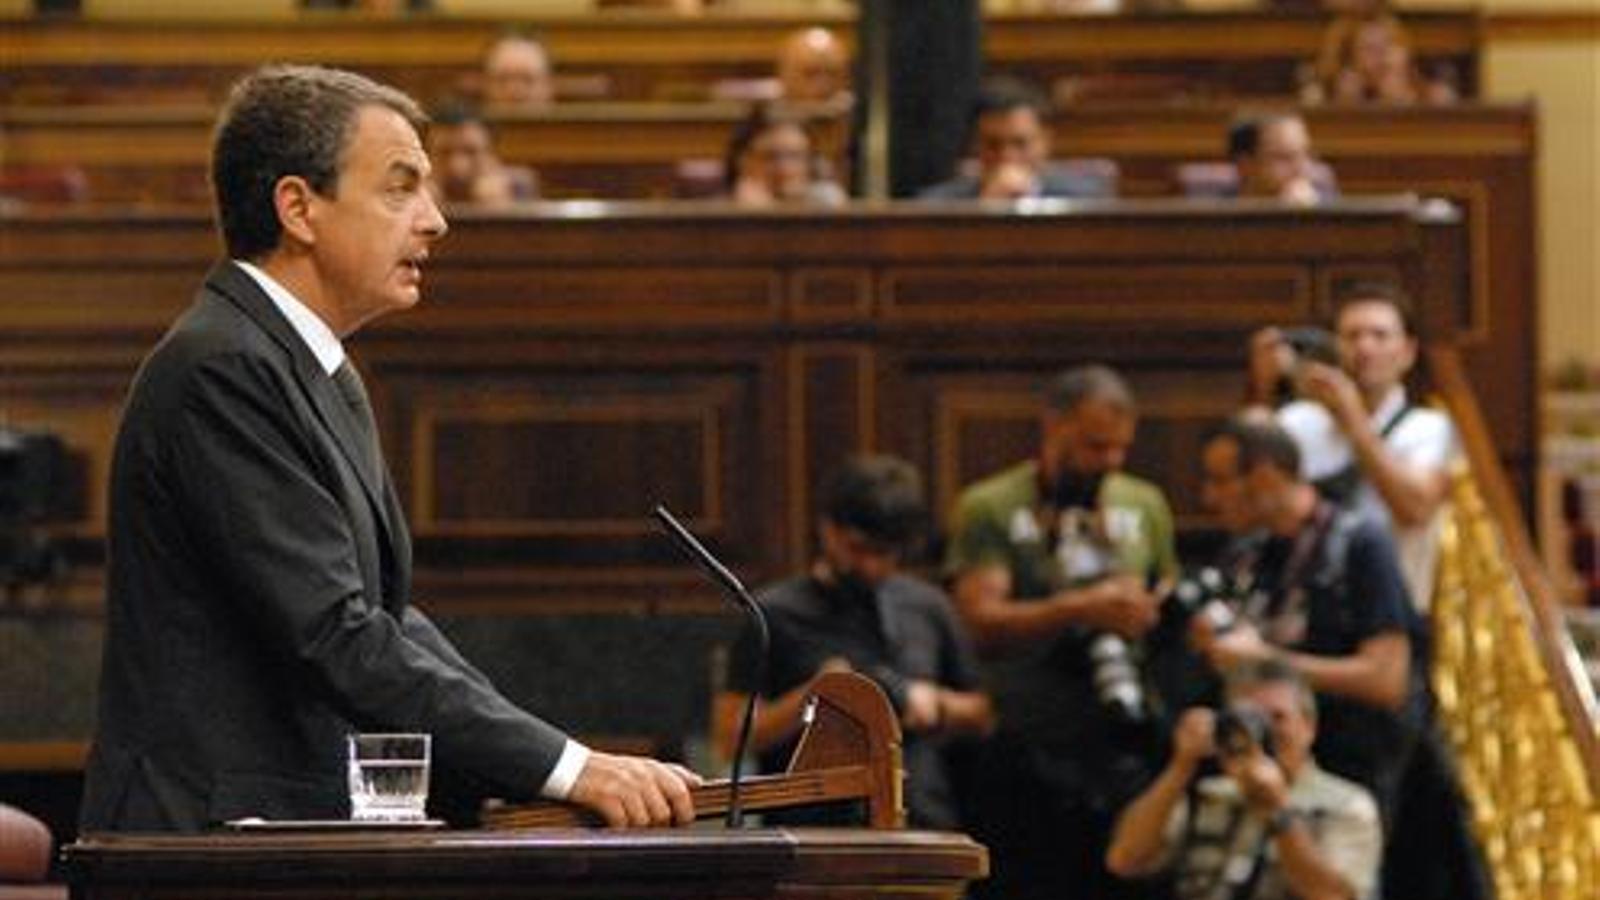 Zapatero, al Congrés, en una imatge d'arxiu